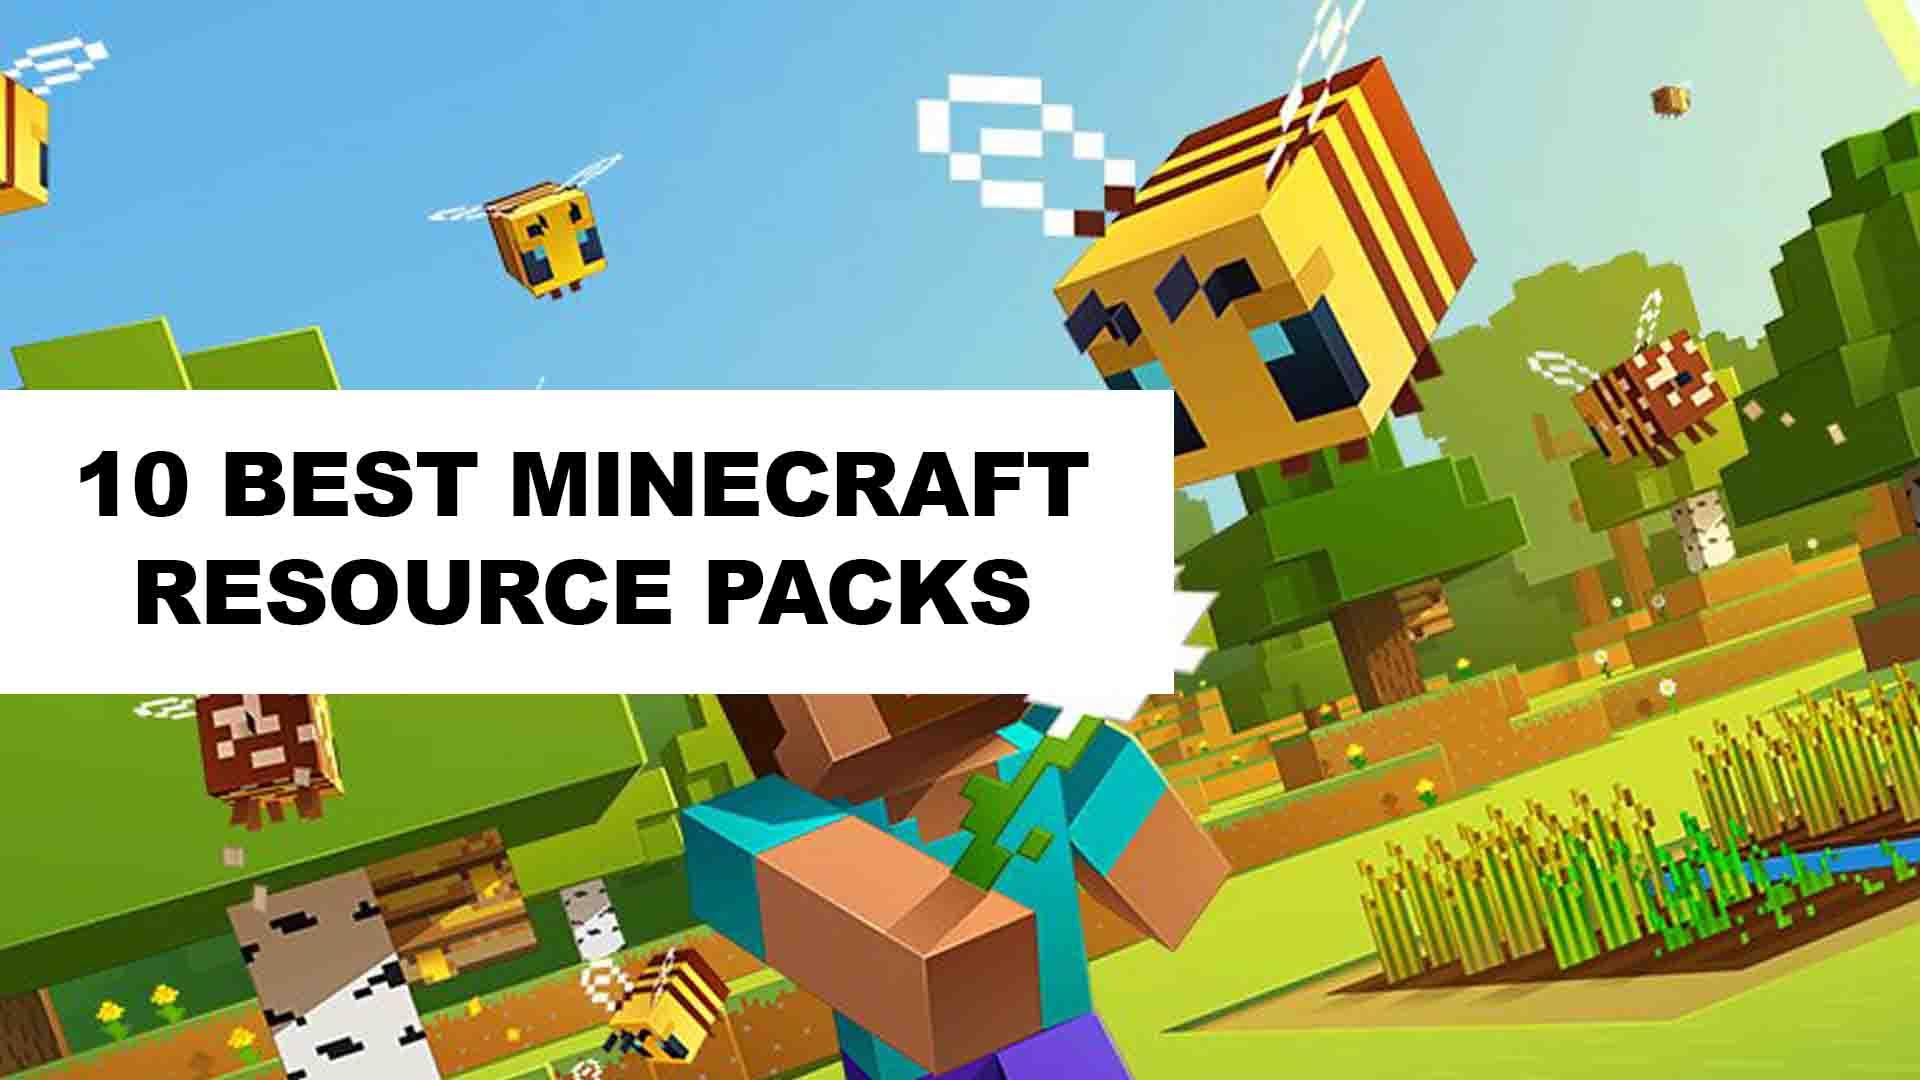 9 Best Minecraft Resource Packs - Texture Packs in 9 - WikiWax